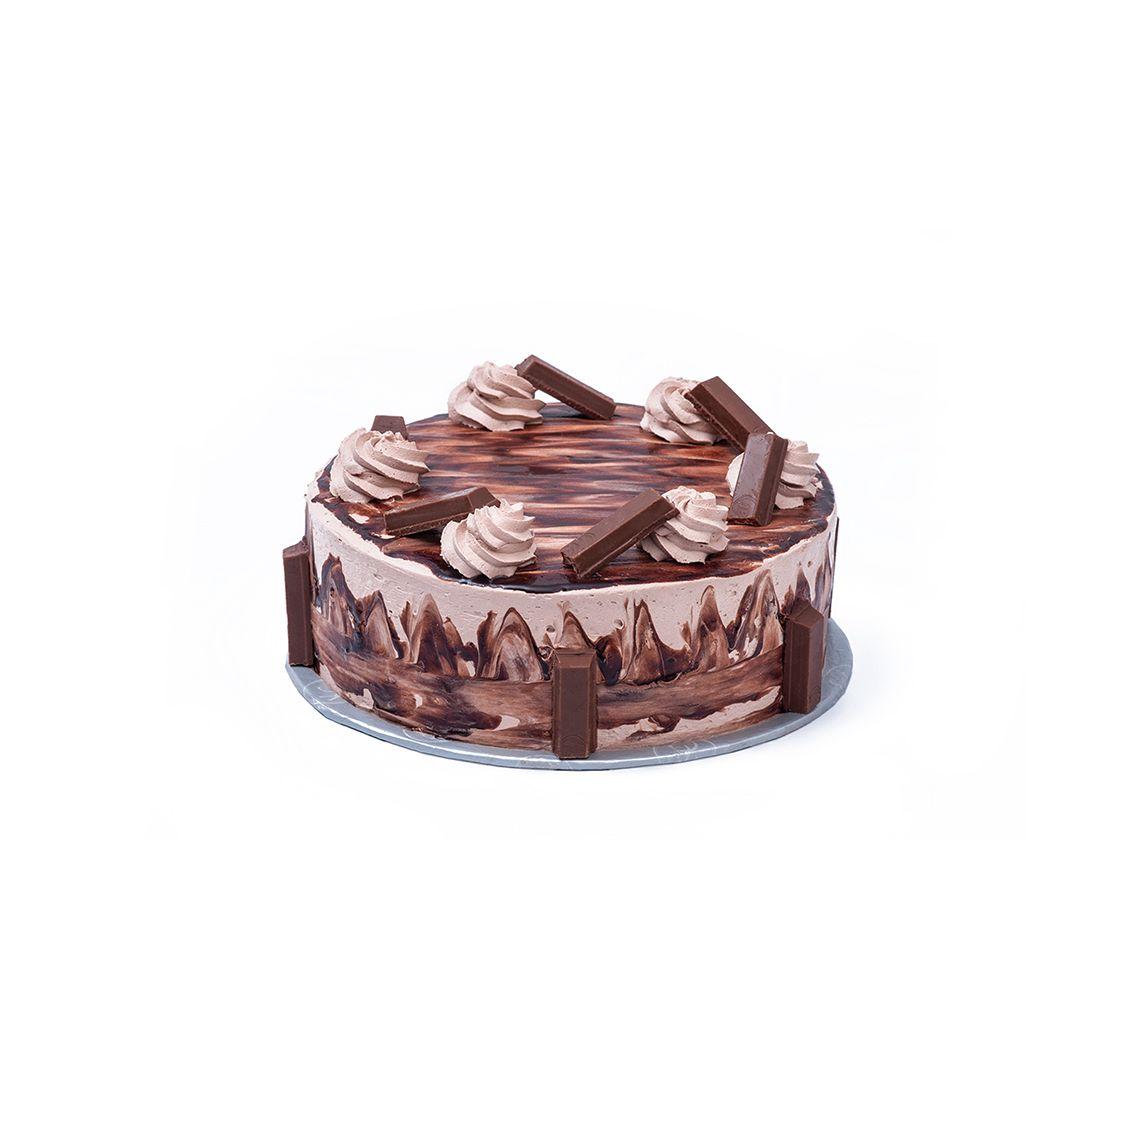 Kitchen Cuisine Default Category KitKat Chocolate Cream Cake